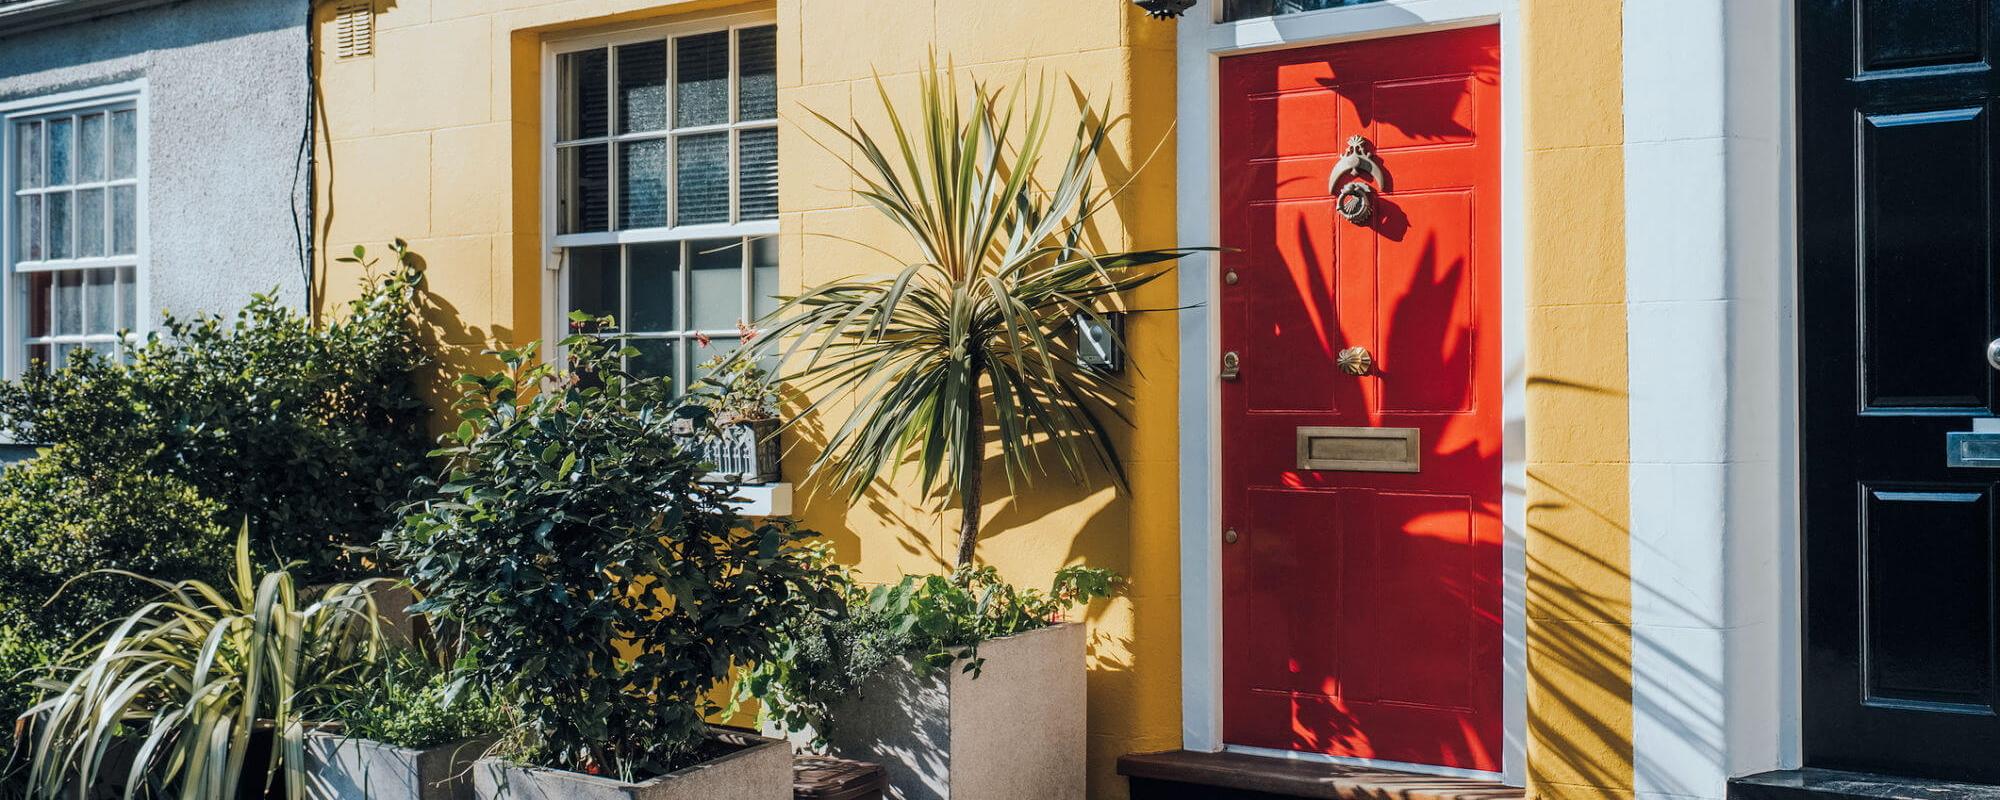 Coleshill Windows & Doors Ltd